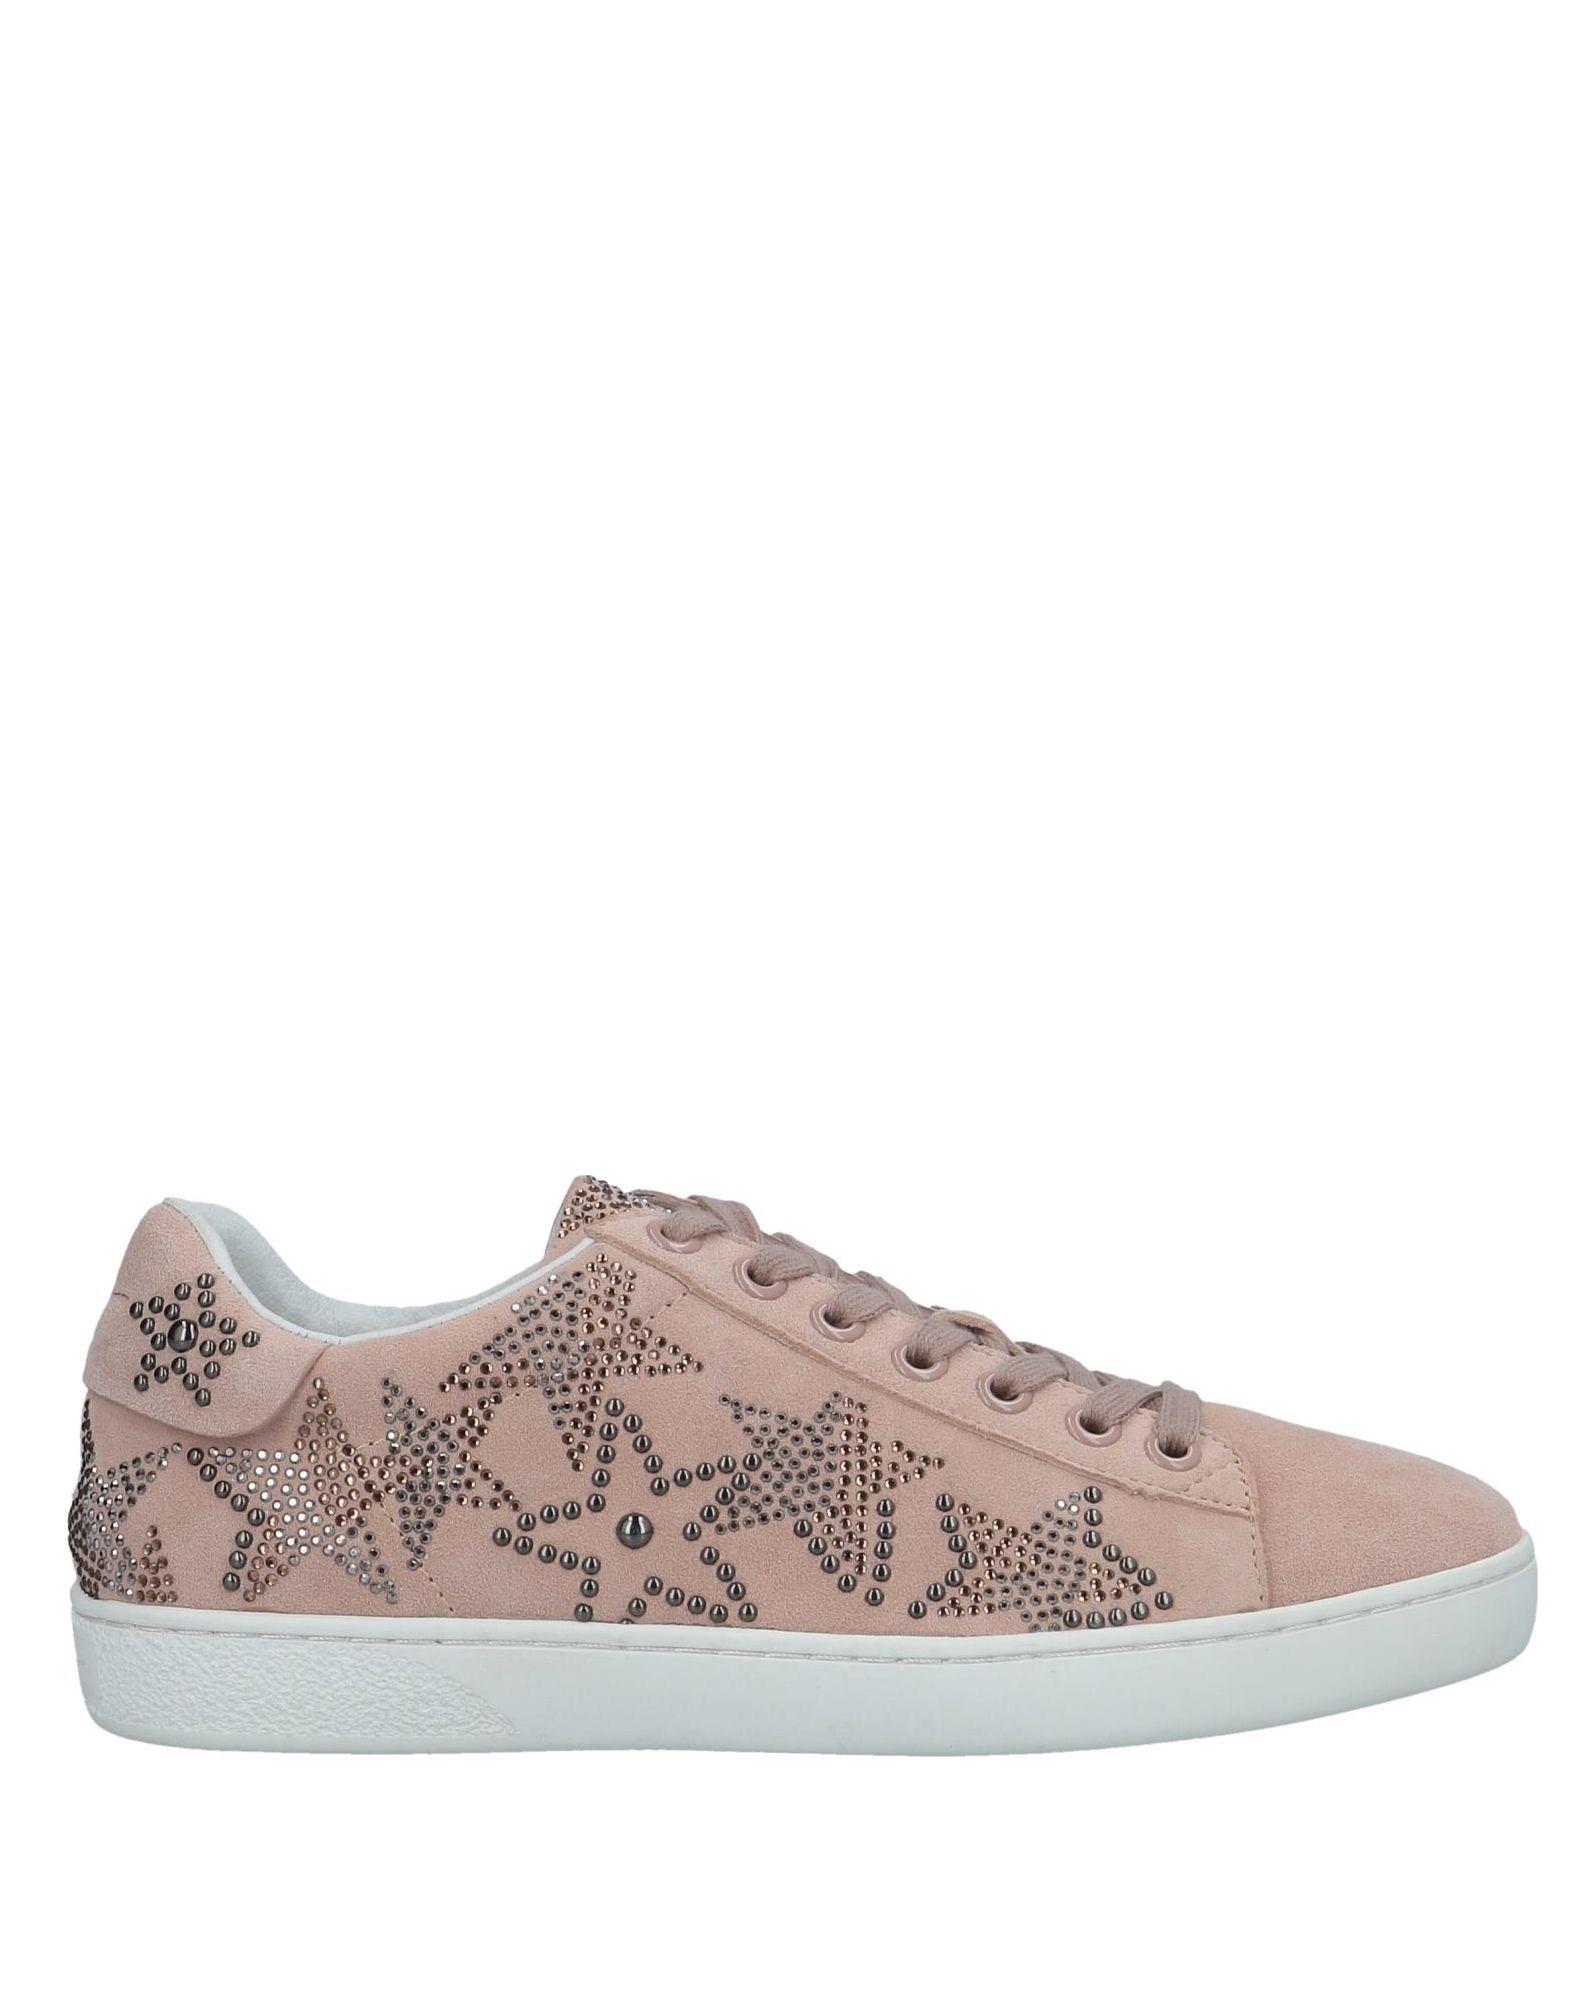 Stilvolle billige Schuhe  Lola Cruz Sneakers Damen  Schuhe 11553225FS 0b6791